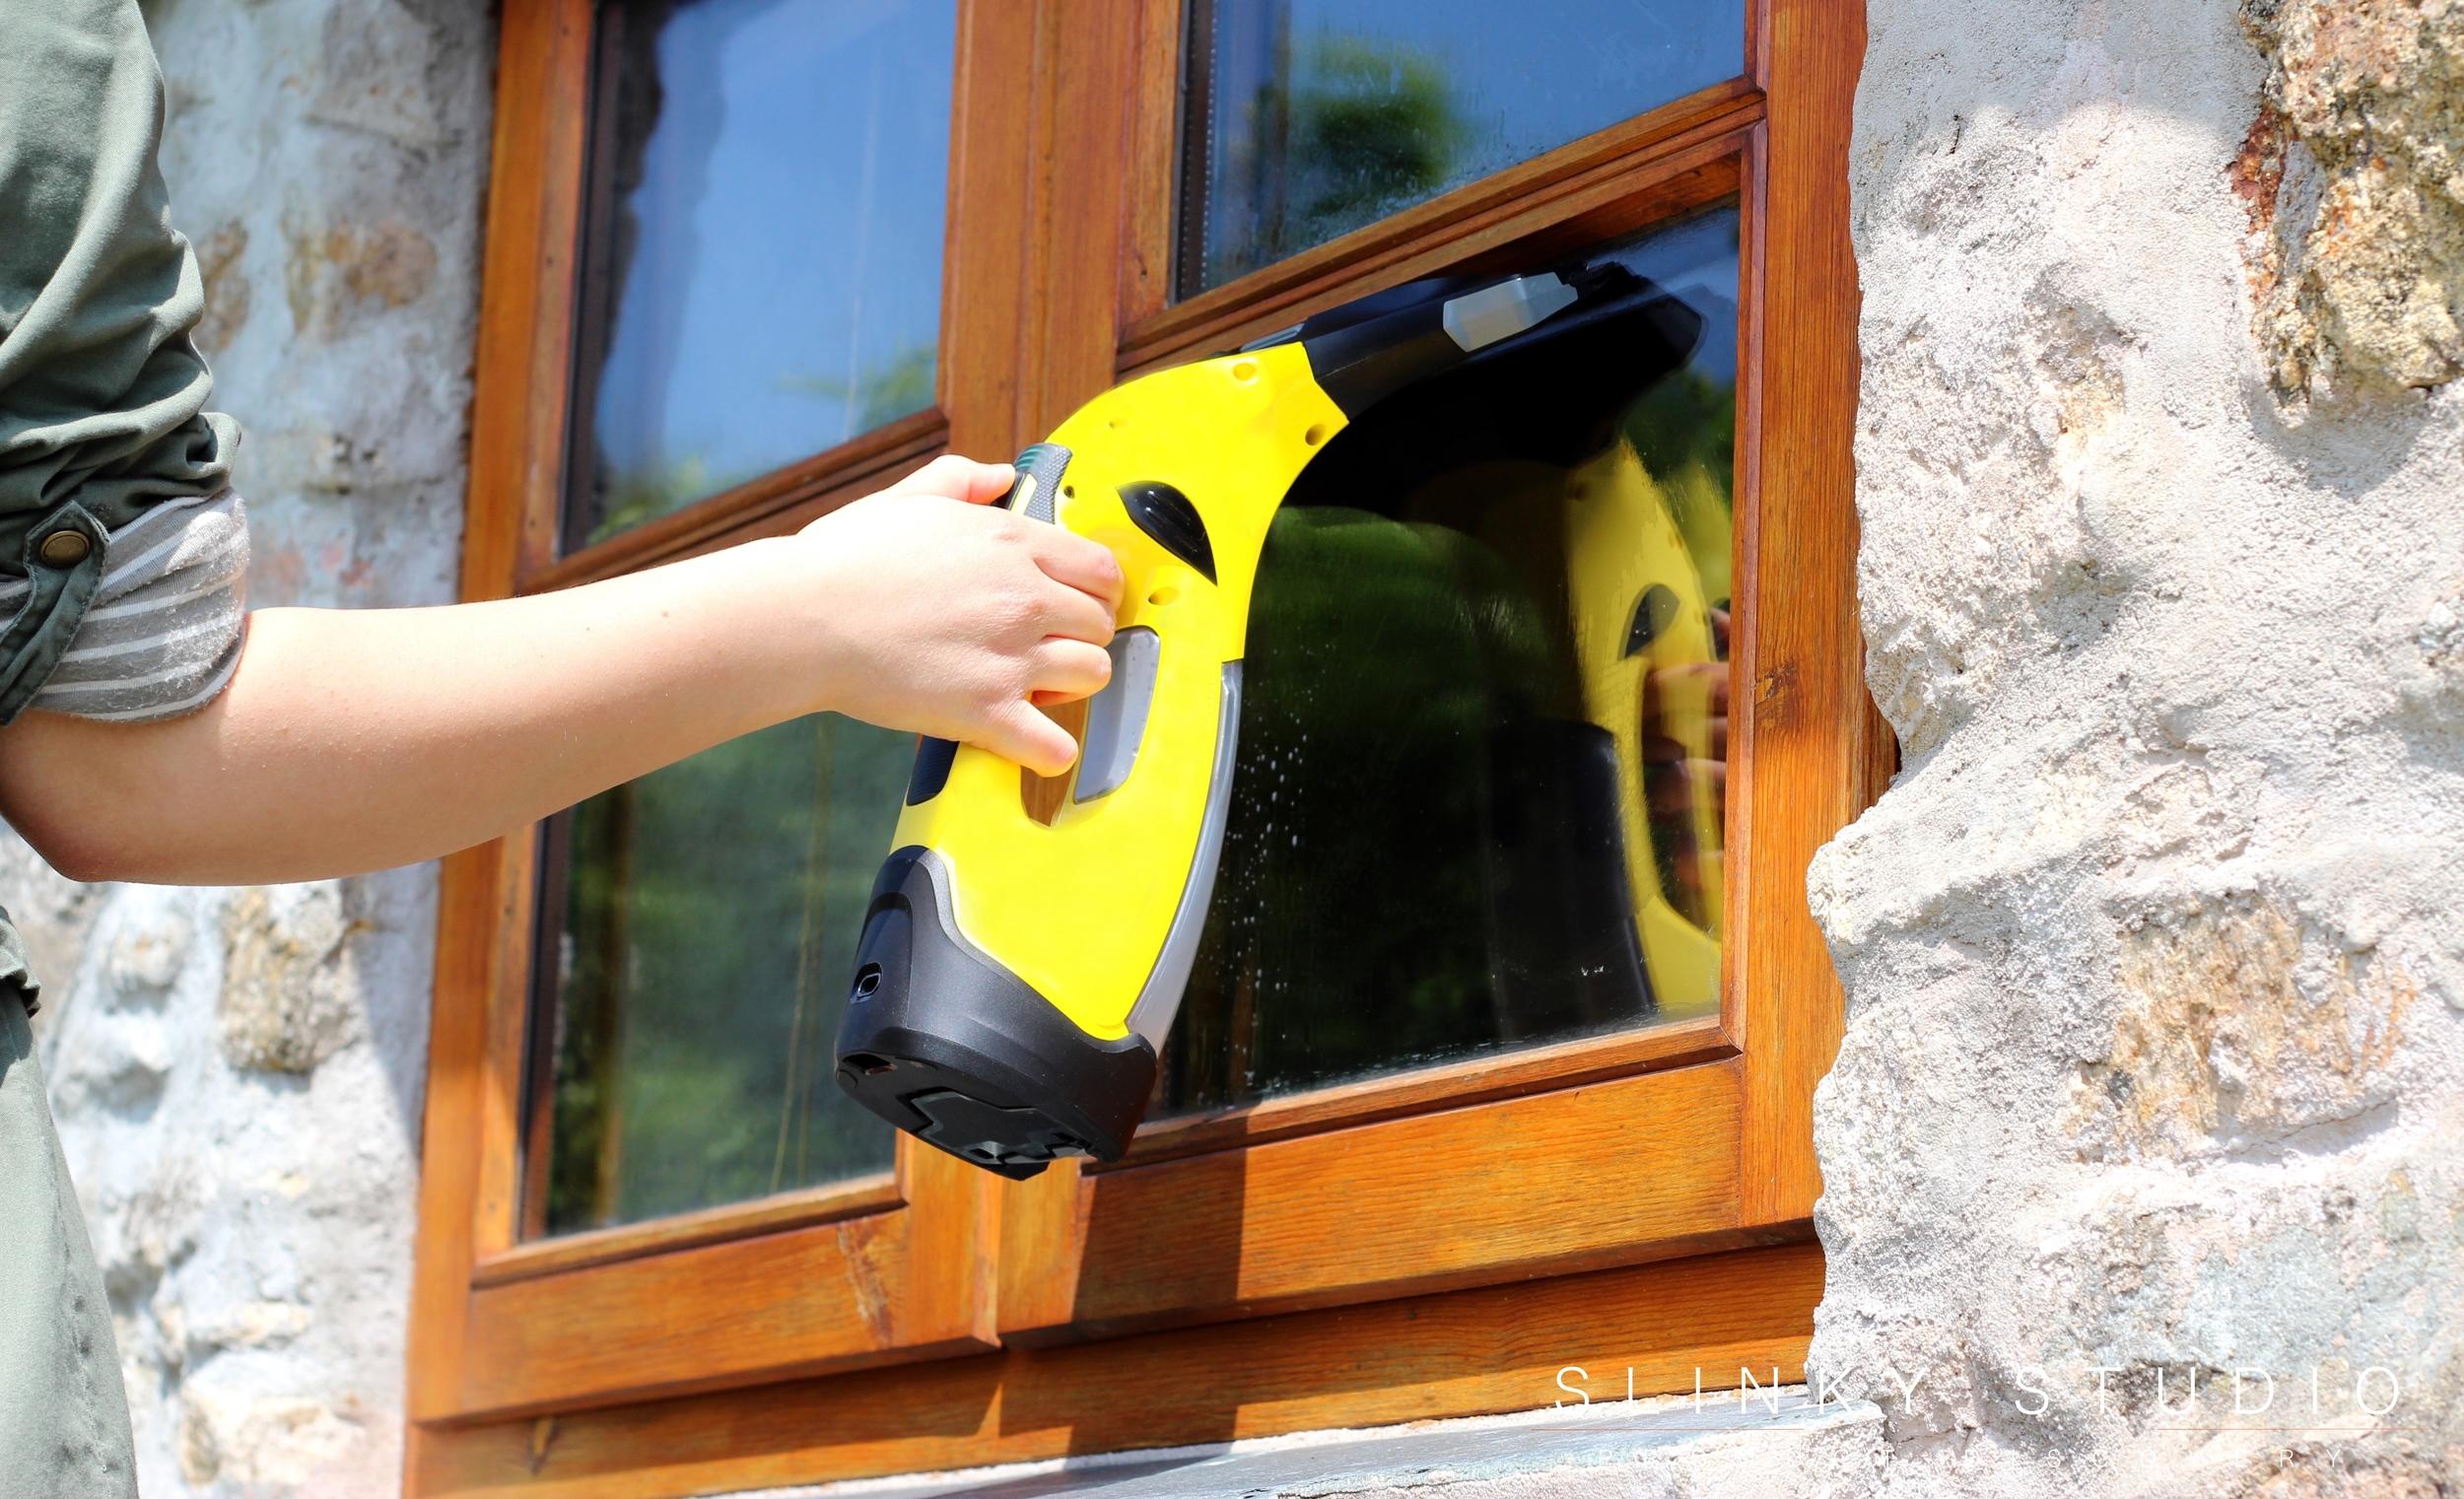 Kärcher WV5 Premium Window Vac Vacuuming Water off Window.jpg